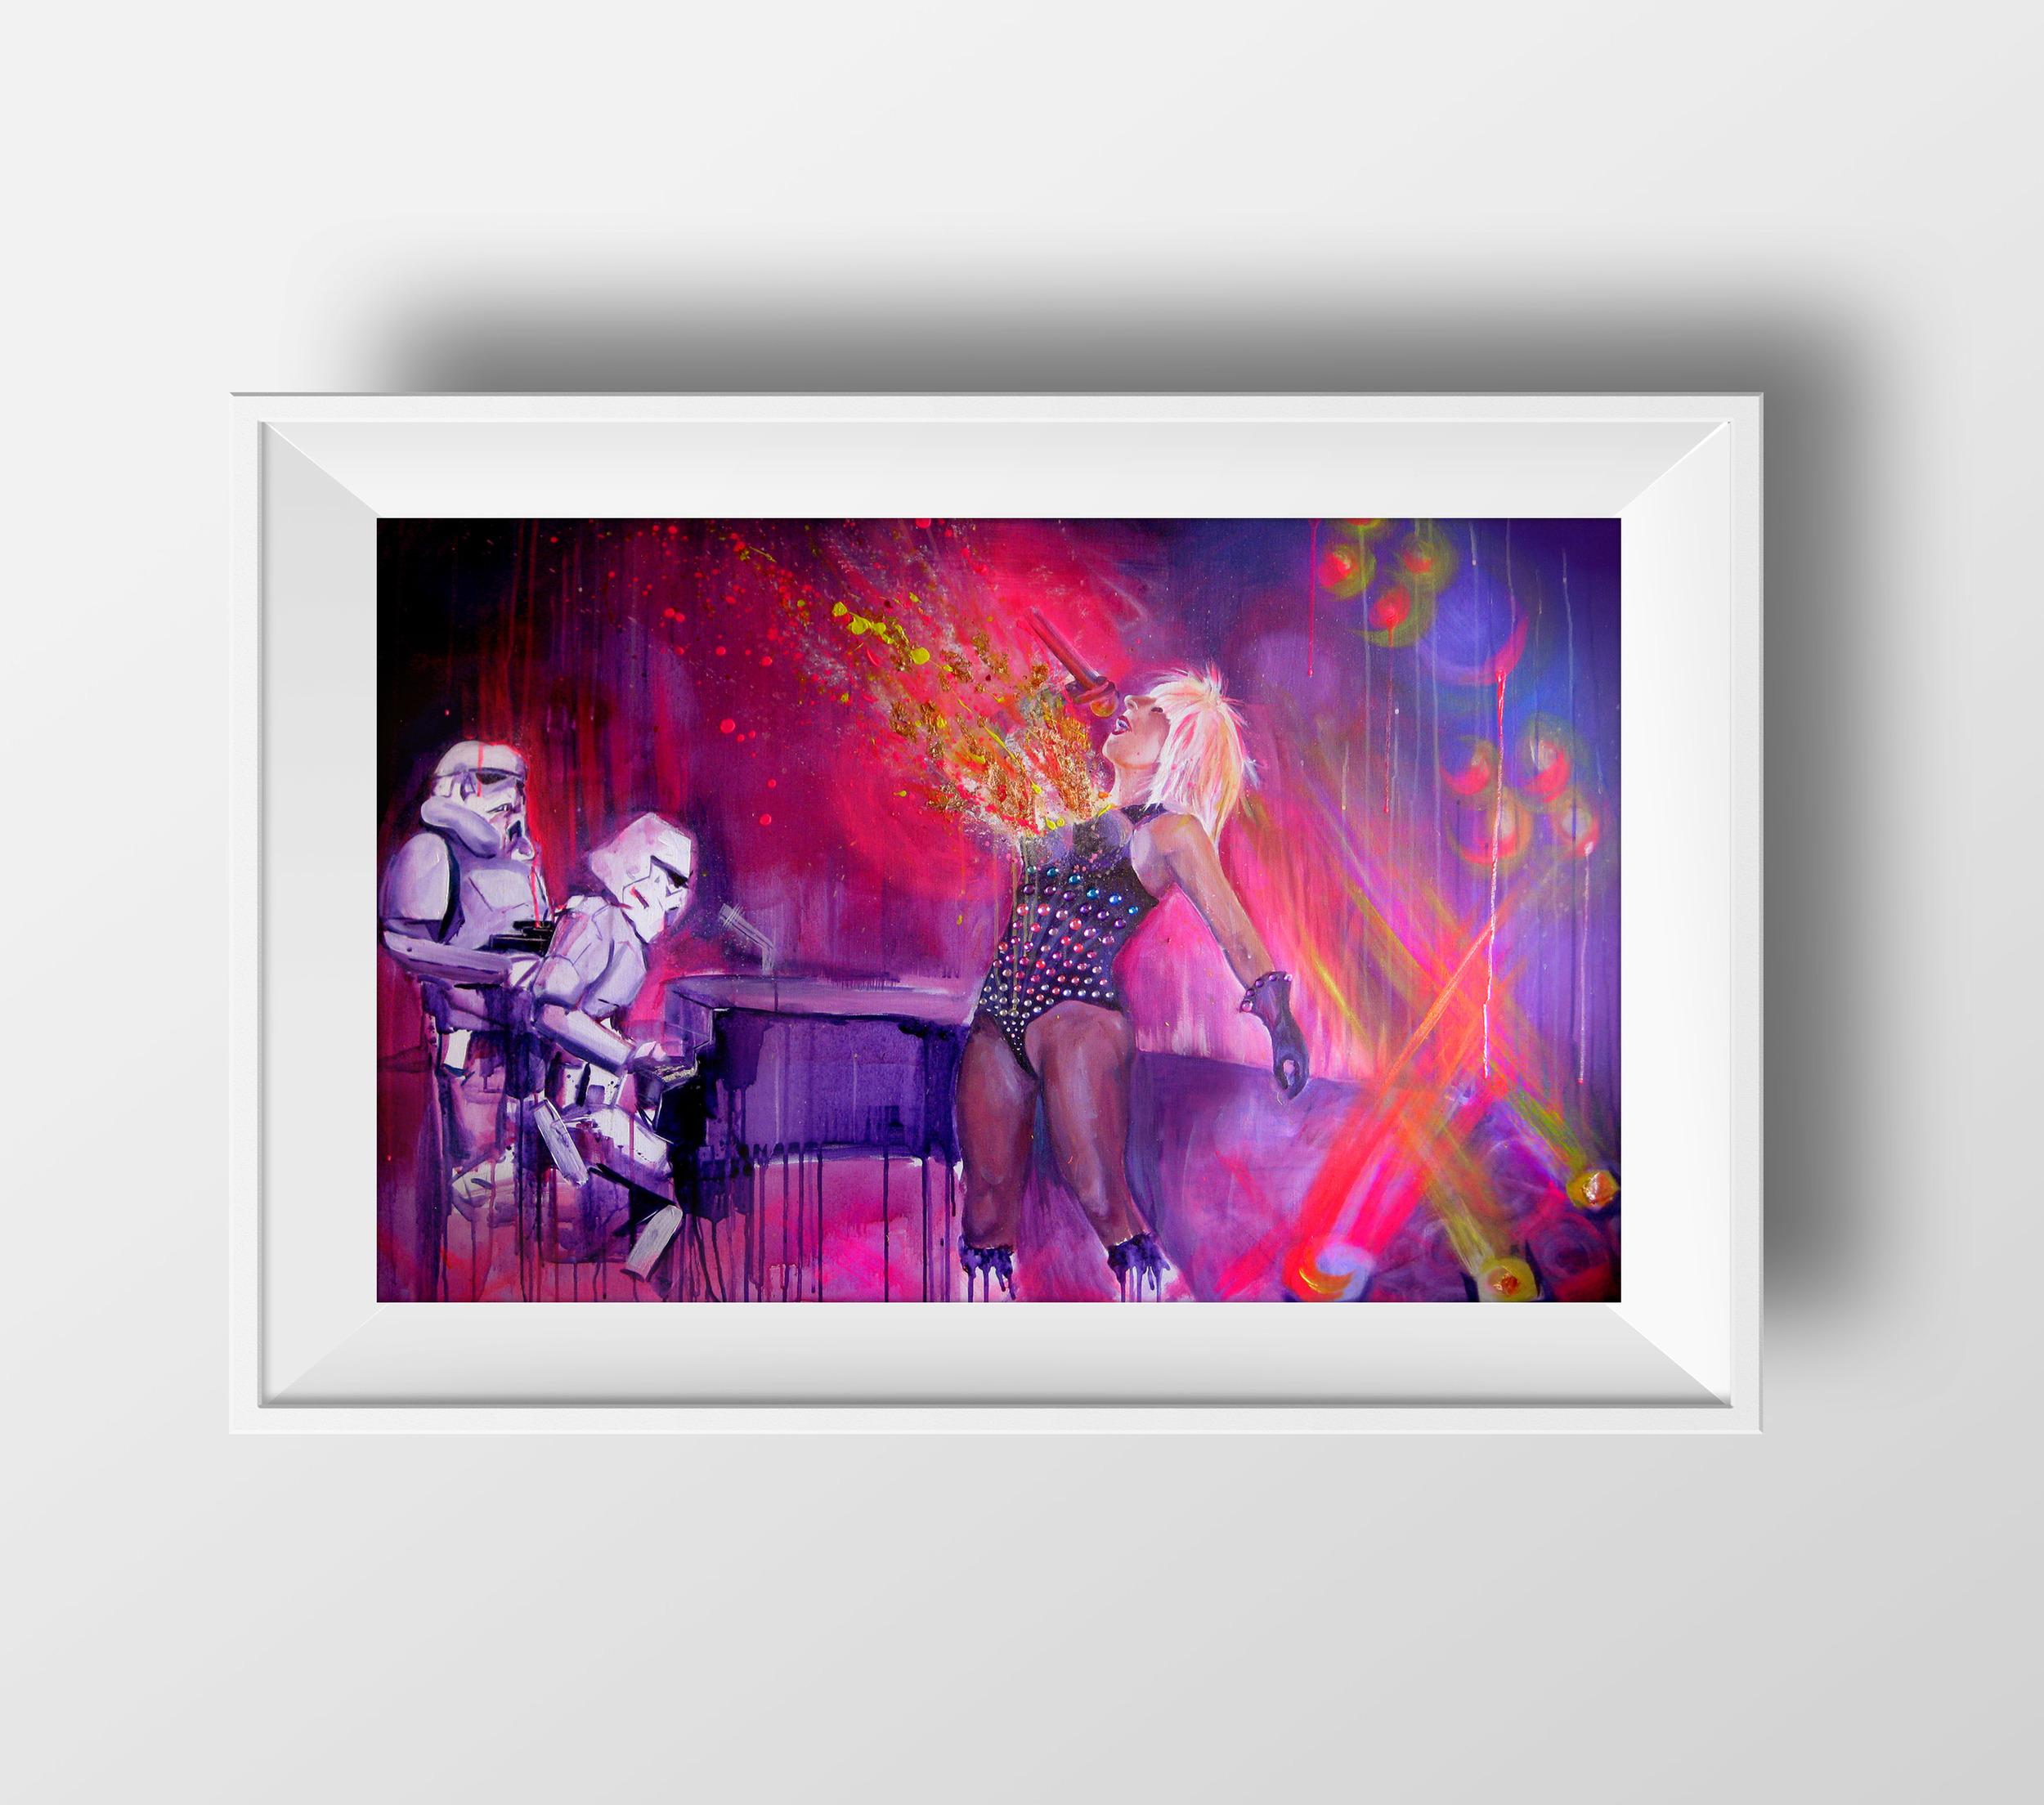 gaga_framed_to-use.jpg